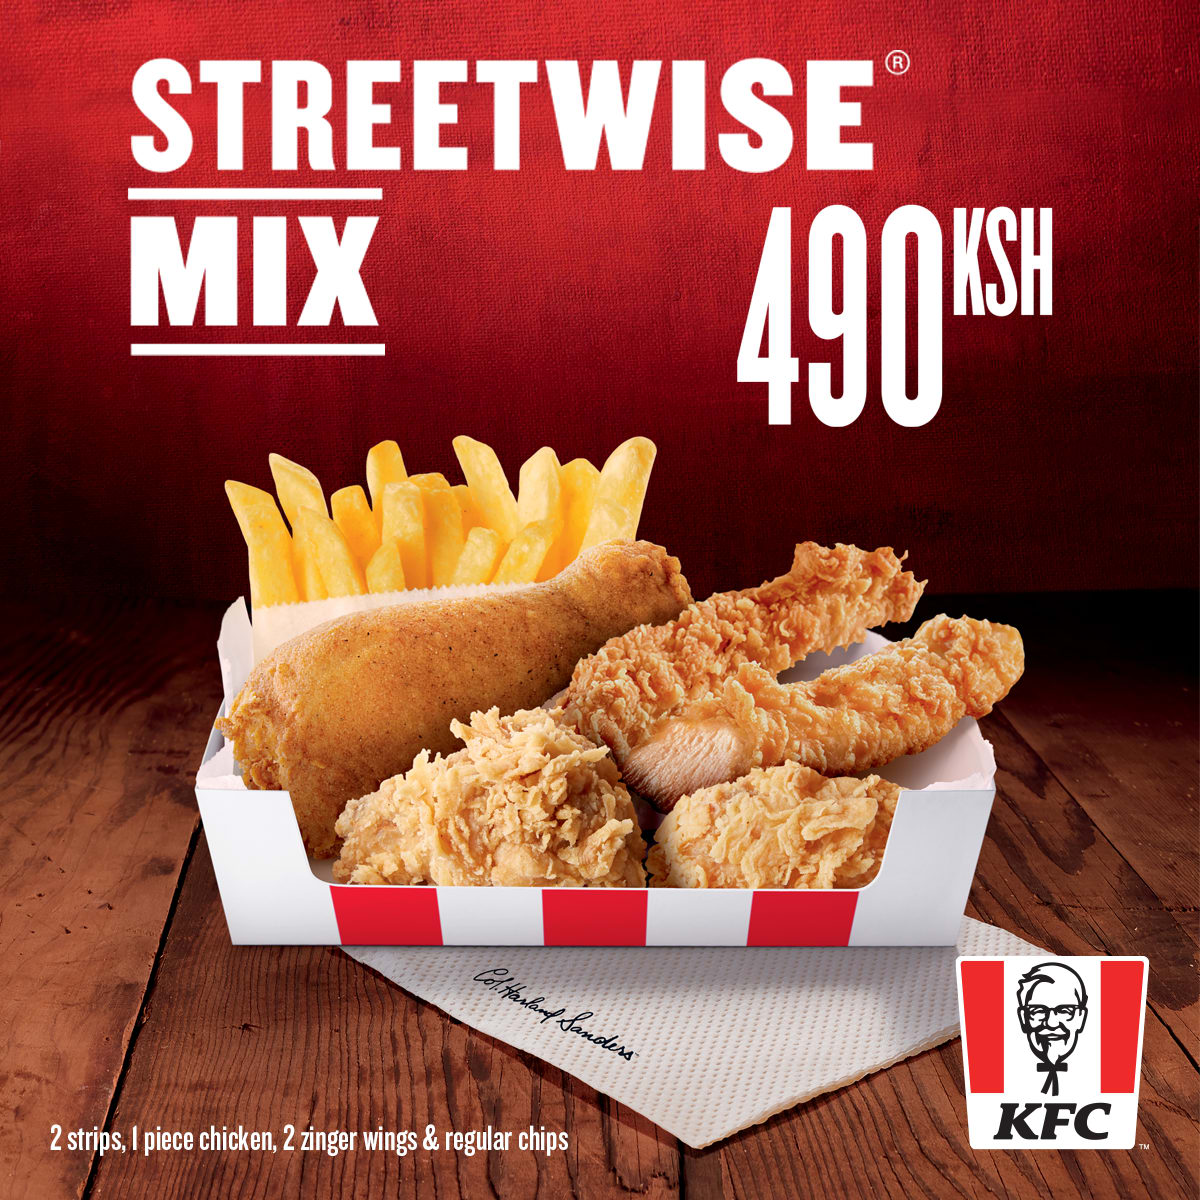 1 chicken on bone, 2 chicken strips, 2 wings, regular chips